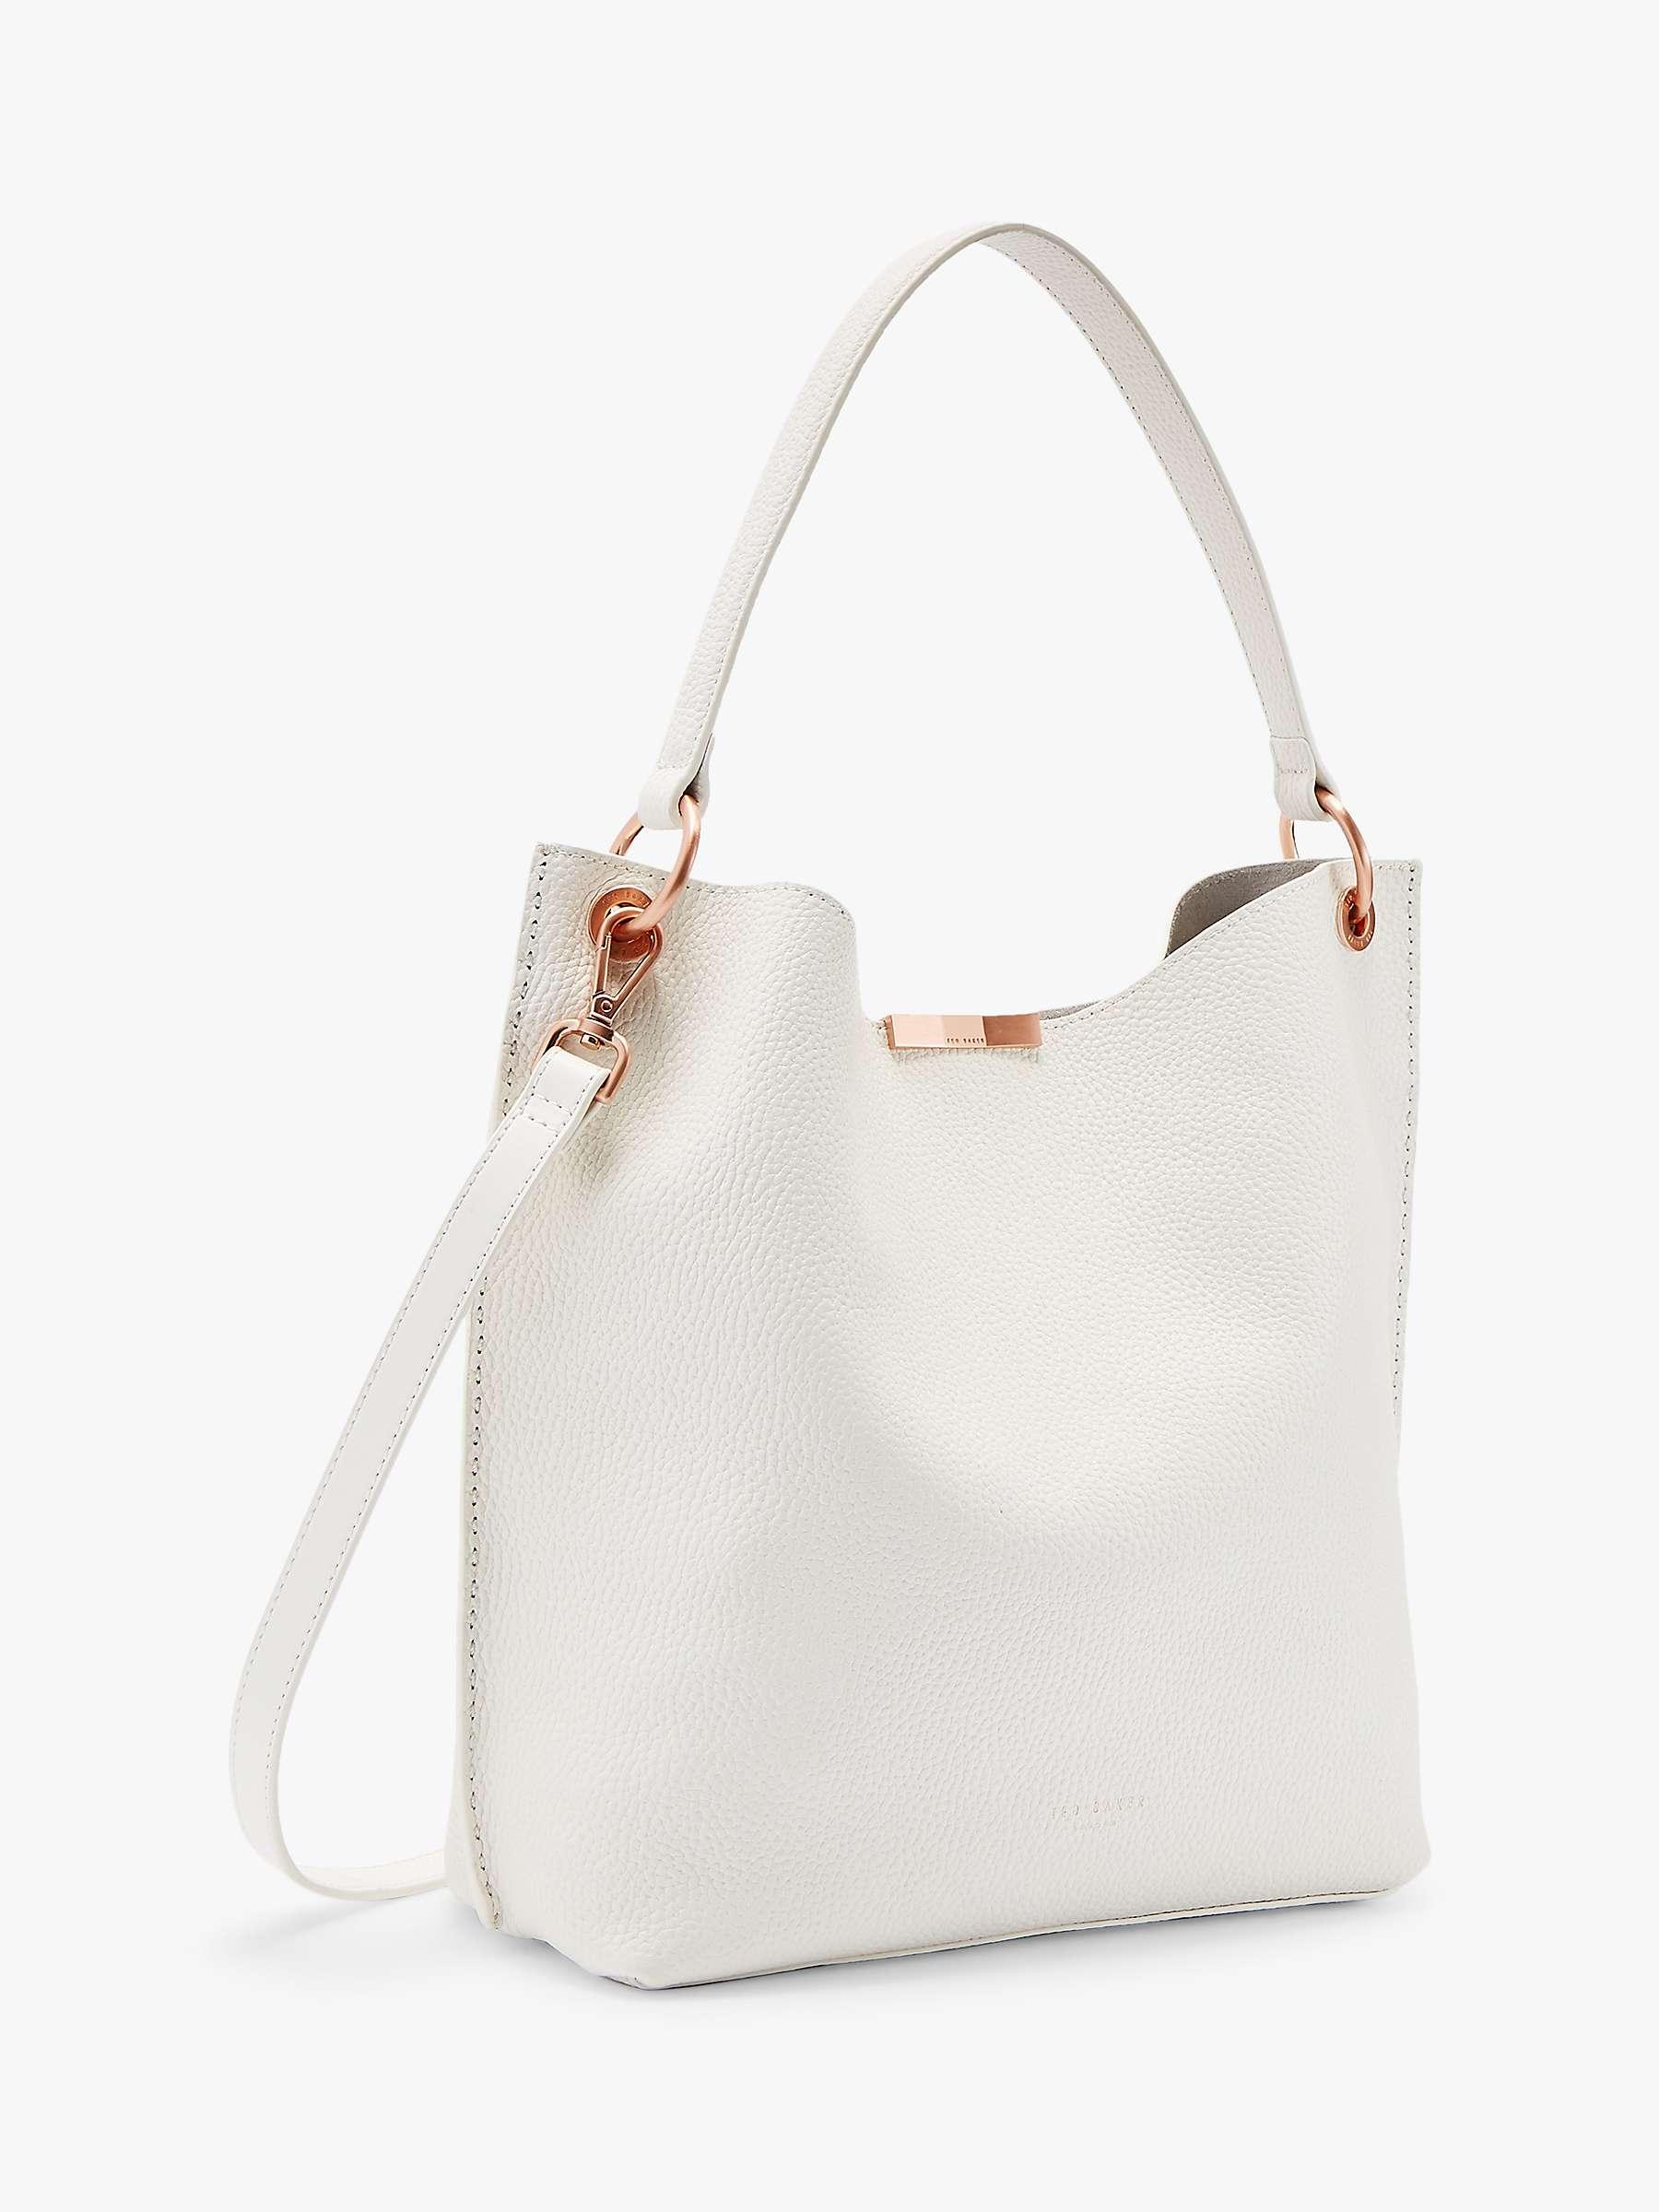 Ted Baker Cane Leather Hobo Bag White